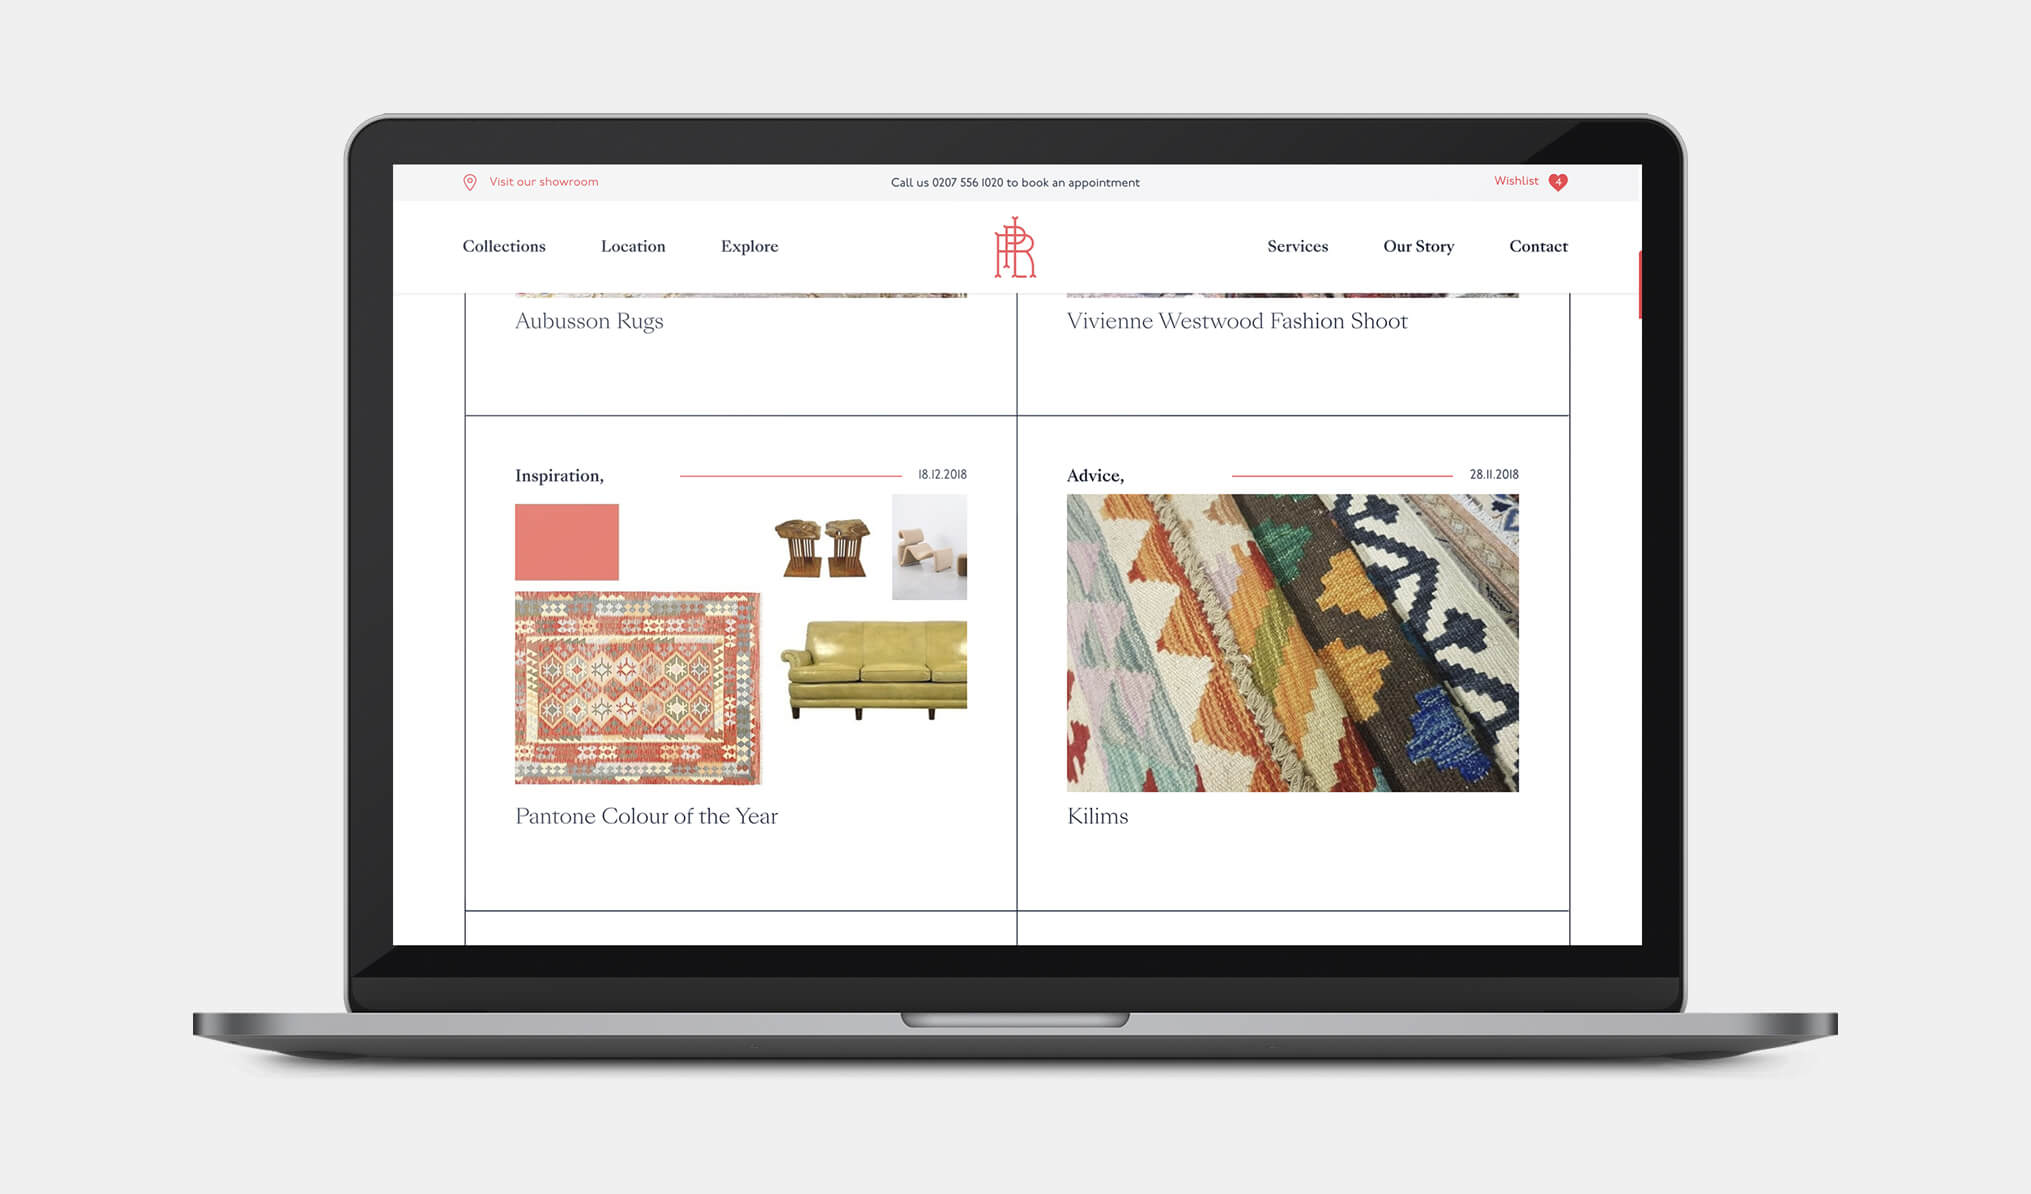 Chanelle-Sharp-Digital-Designer-Portfolio-London-Persian-Rug-Company-Desktop-4